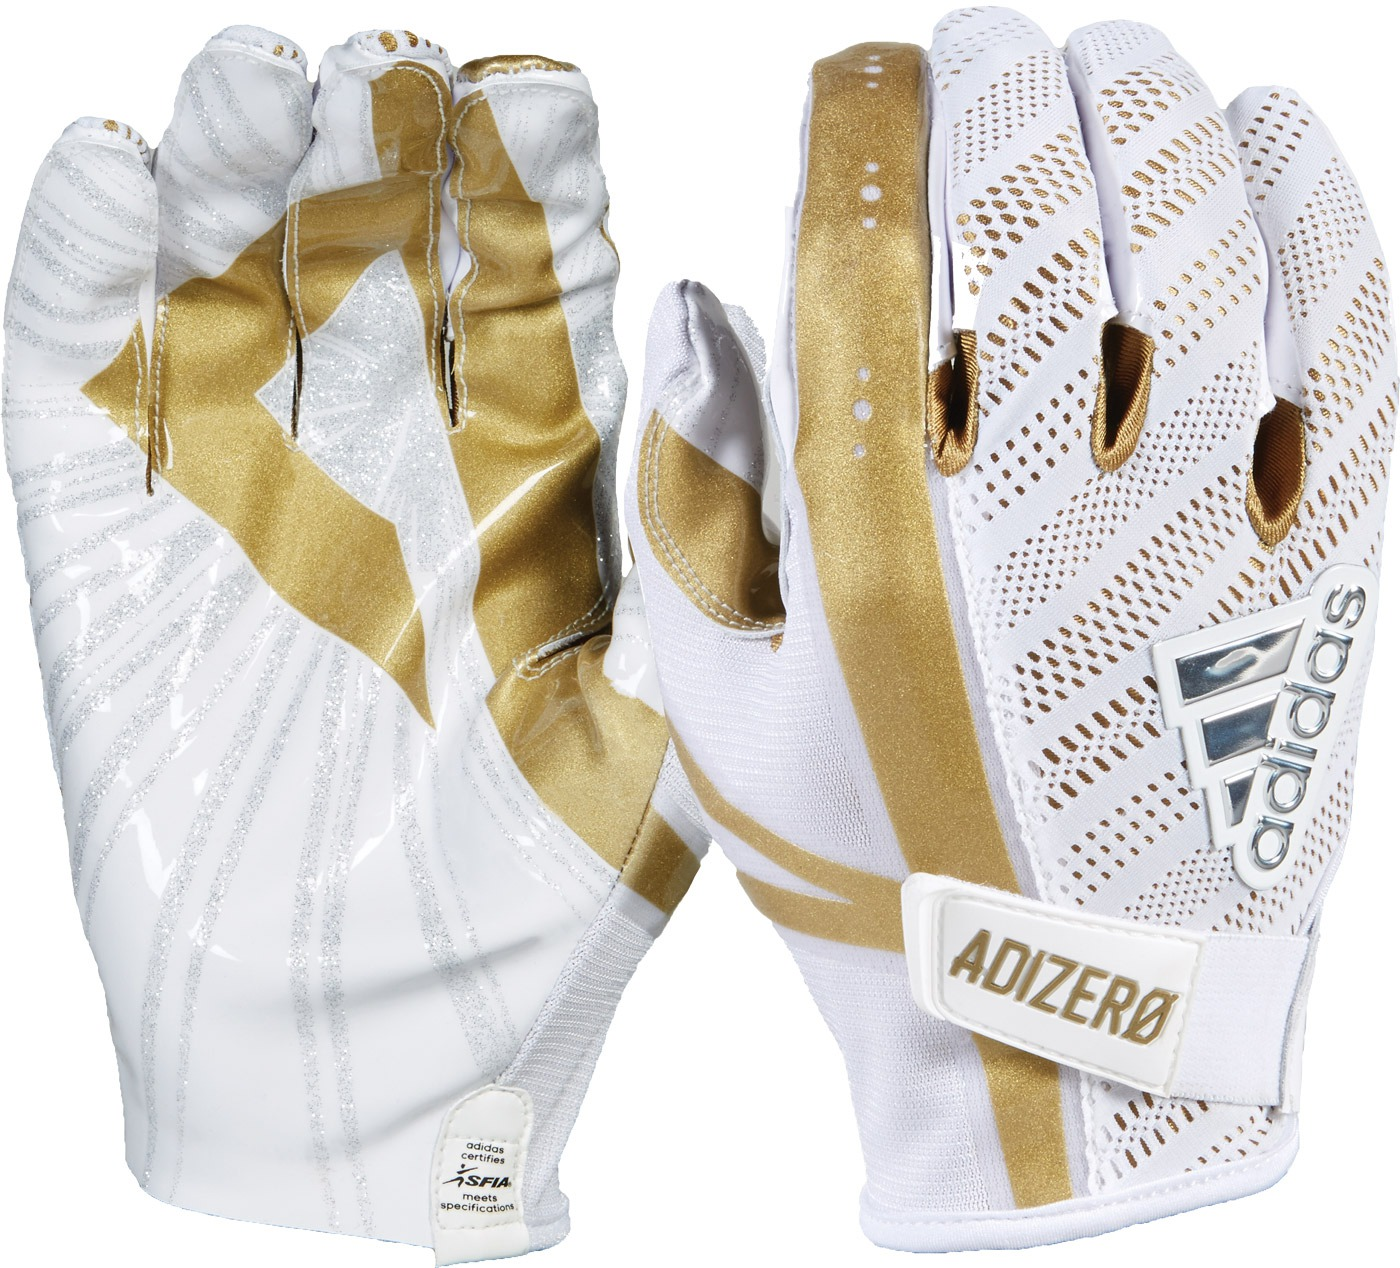 Adidas Adizero 5-Star 6.0 Adult Football Receiver Gloves